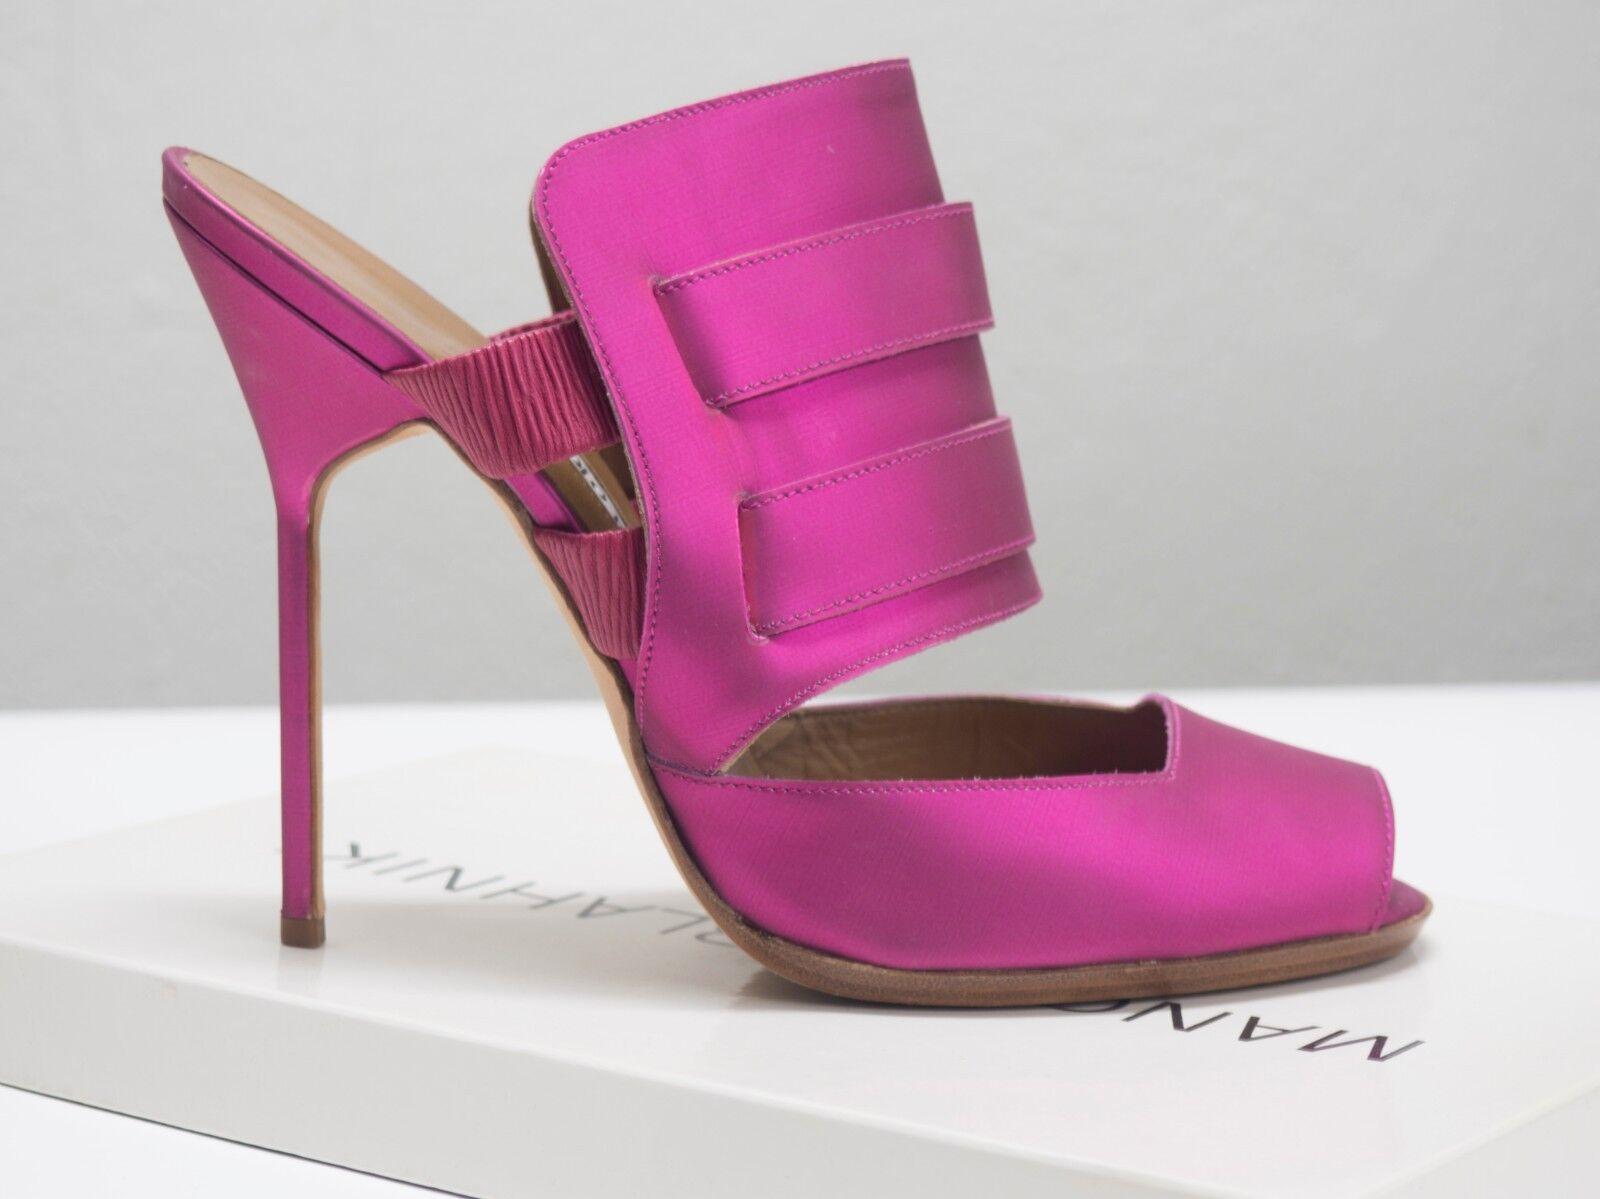 MANOLO BLAHNIK High Heels Hot Fuxia Palme Palme Palme (EU 40.5, US 9.5) 4672ab